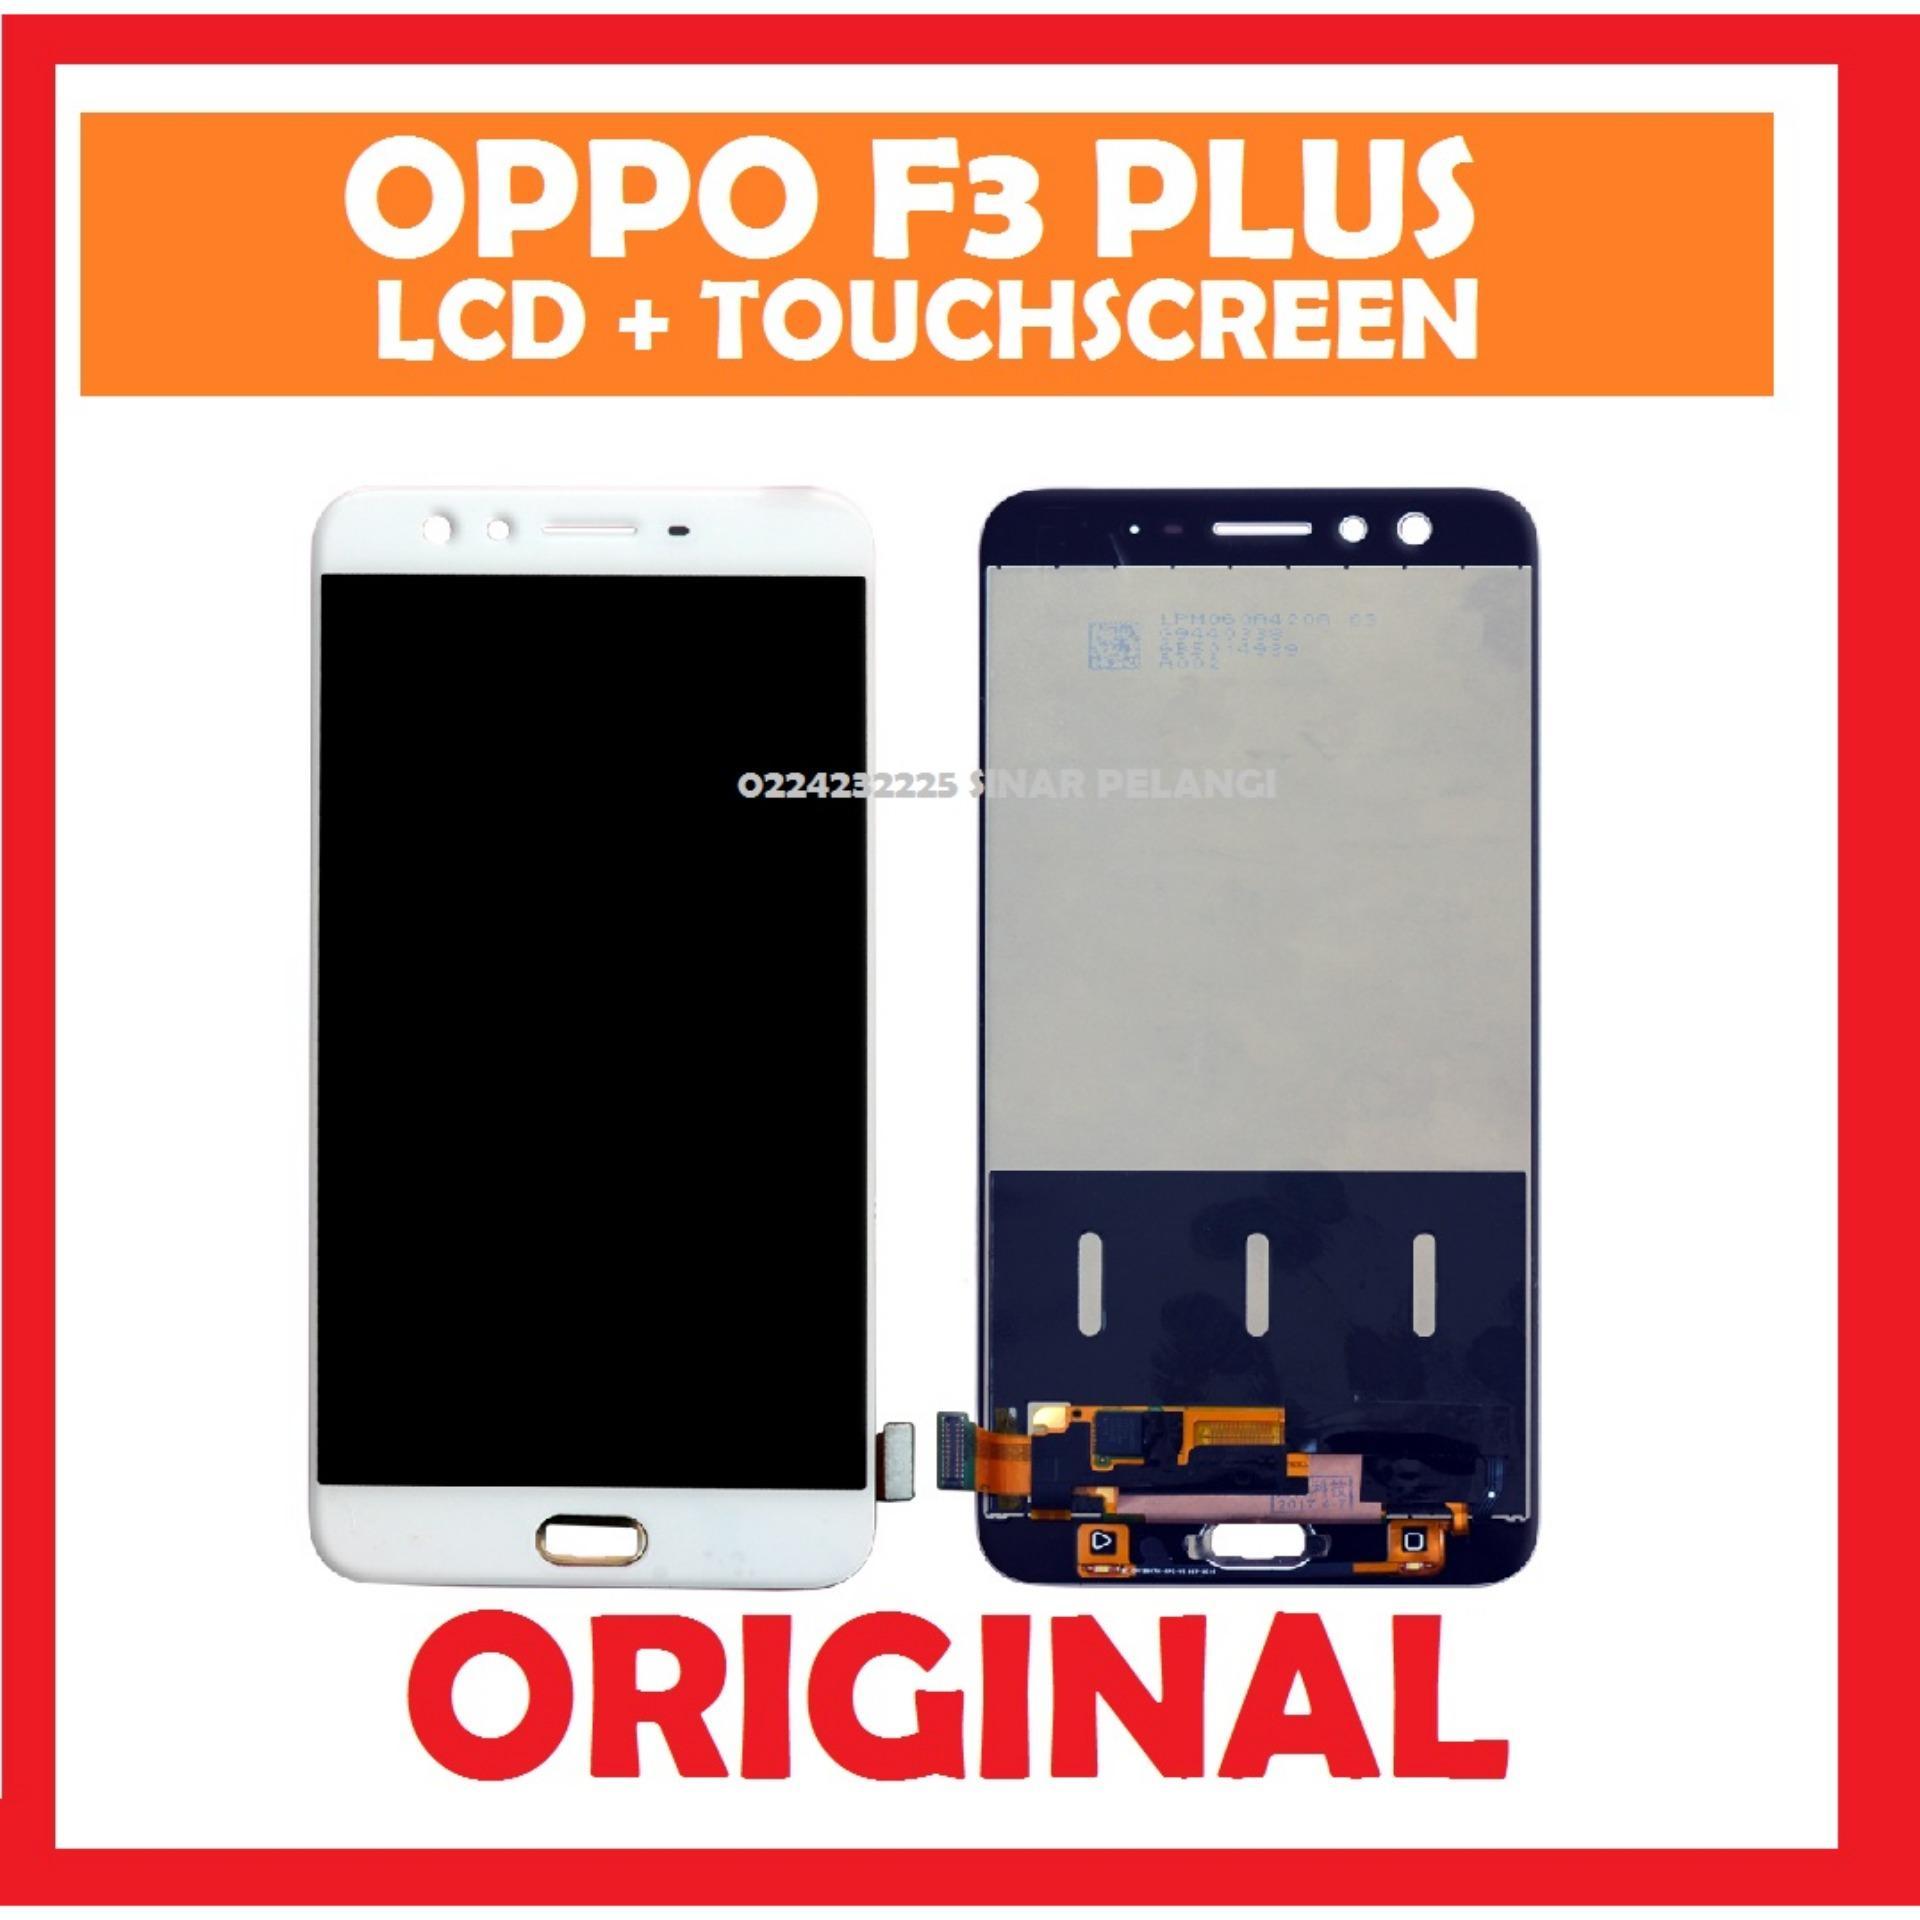 LCD SCREEN LAYAR OPPO F3 F3 PLUS 6 INCH TOUCHSCREEN WHITE 907902